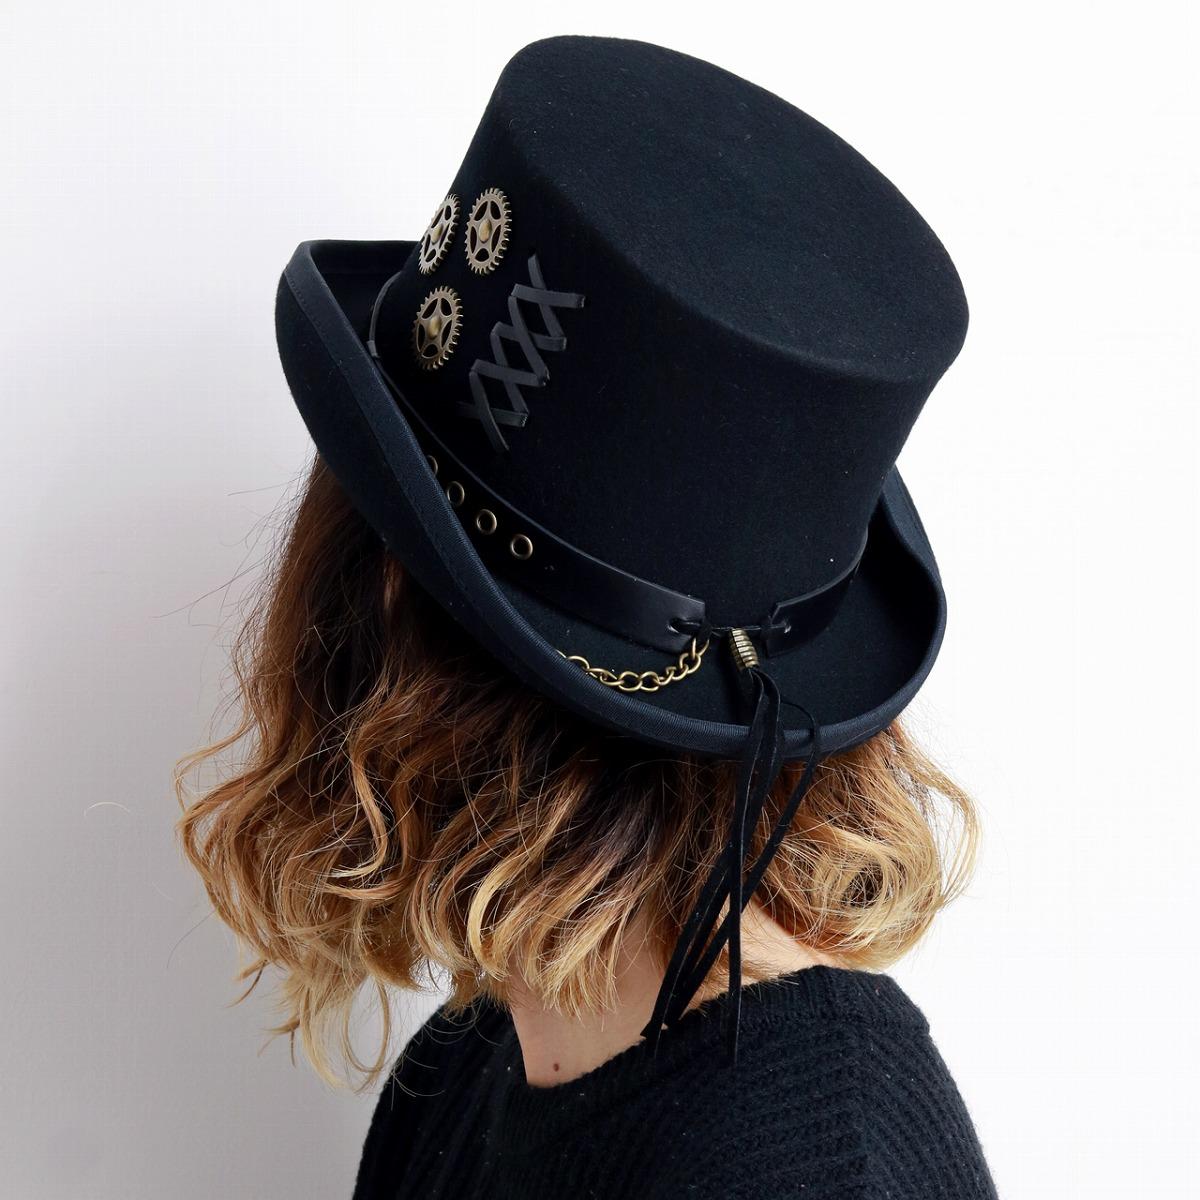 Kenny K Wool Felt Steampunk Top Hat Black